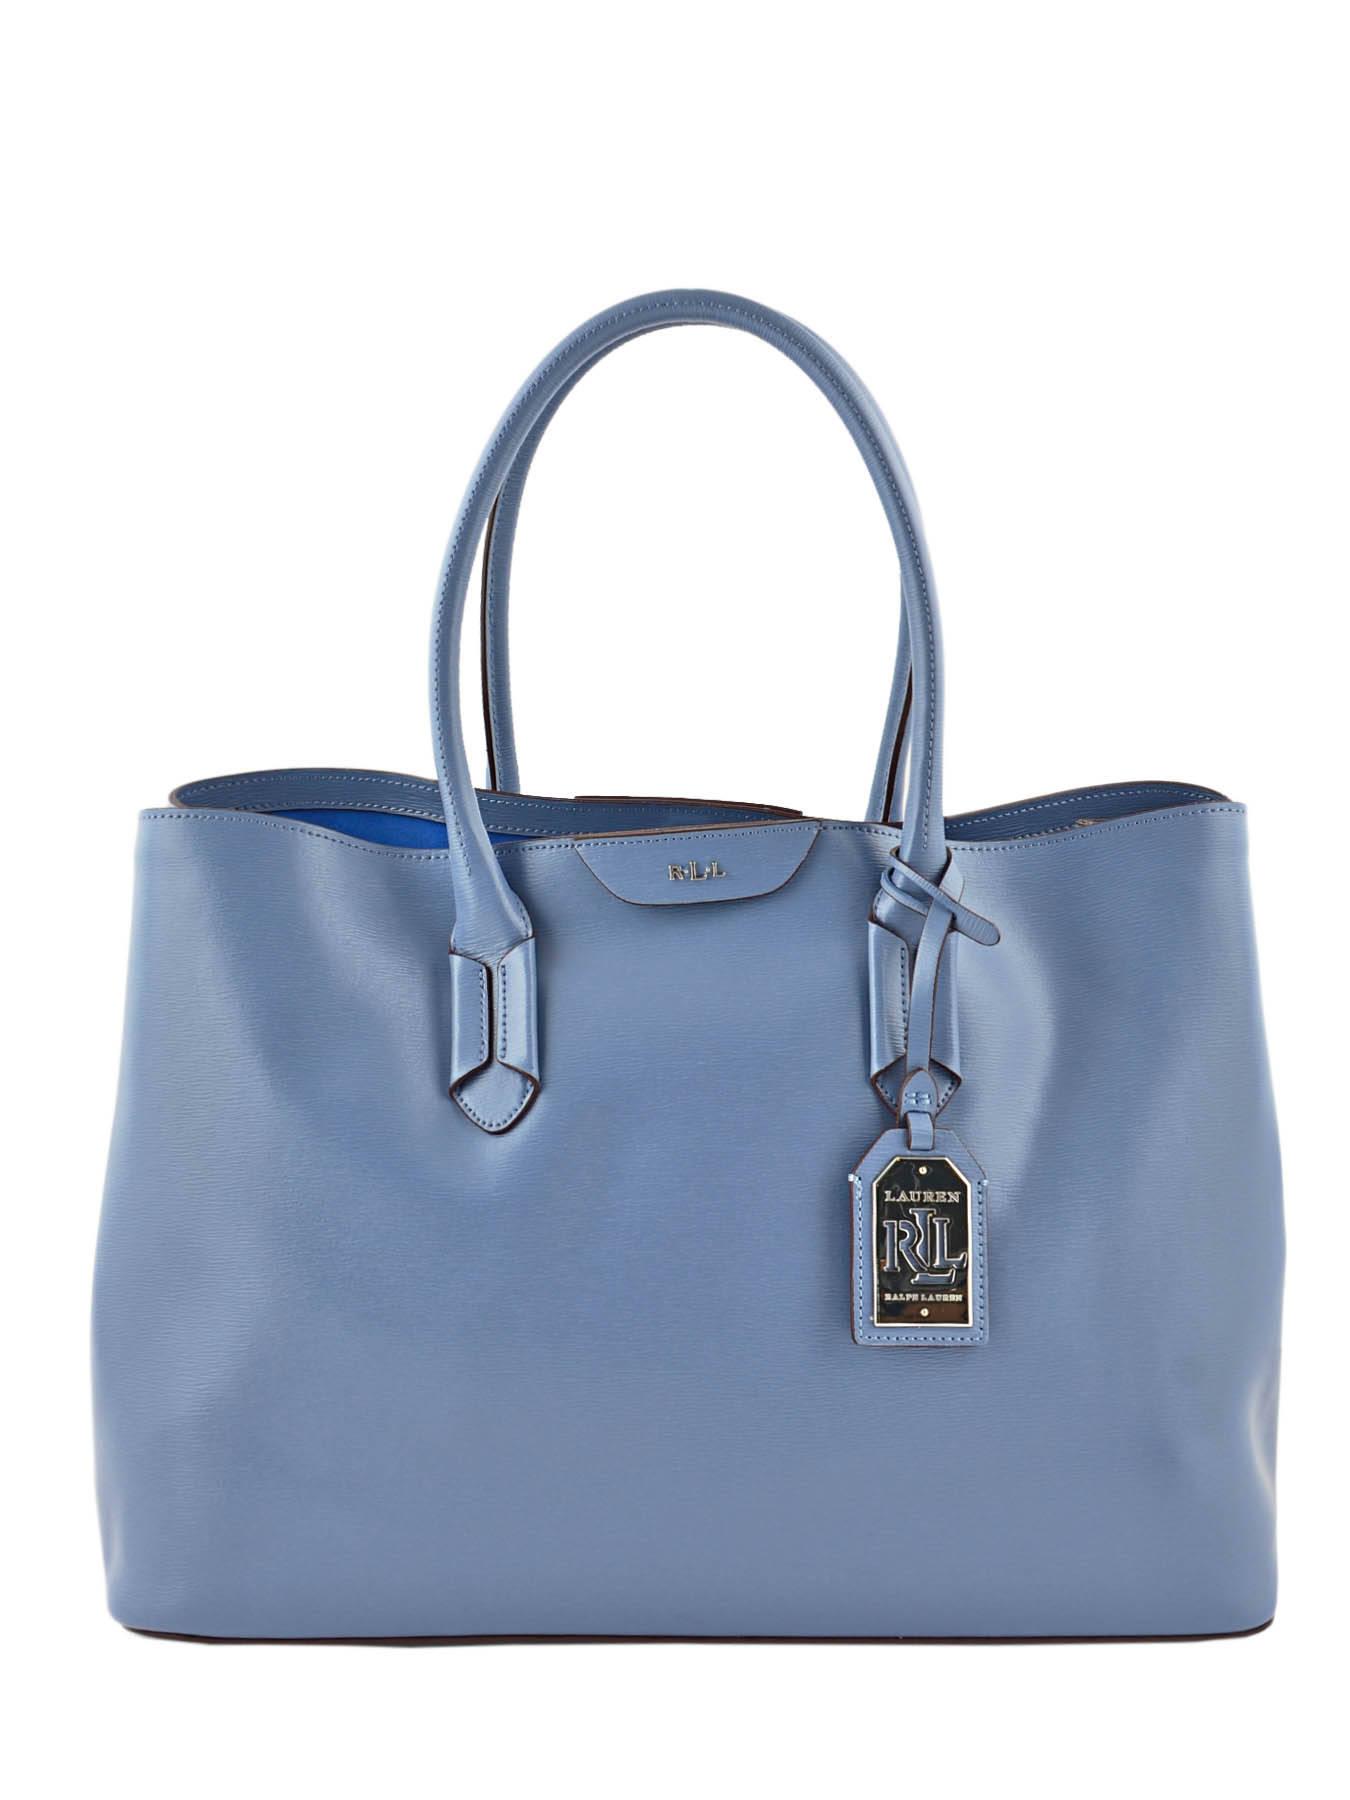 Cabas Tate Cuir Lauren ralph lauren Bleu tate N91L3366